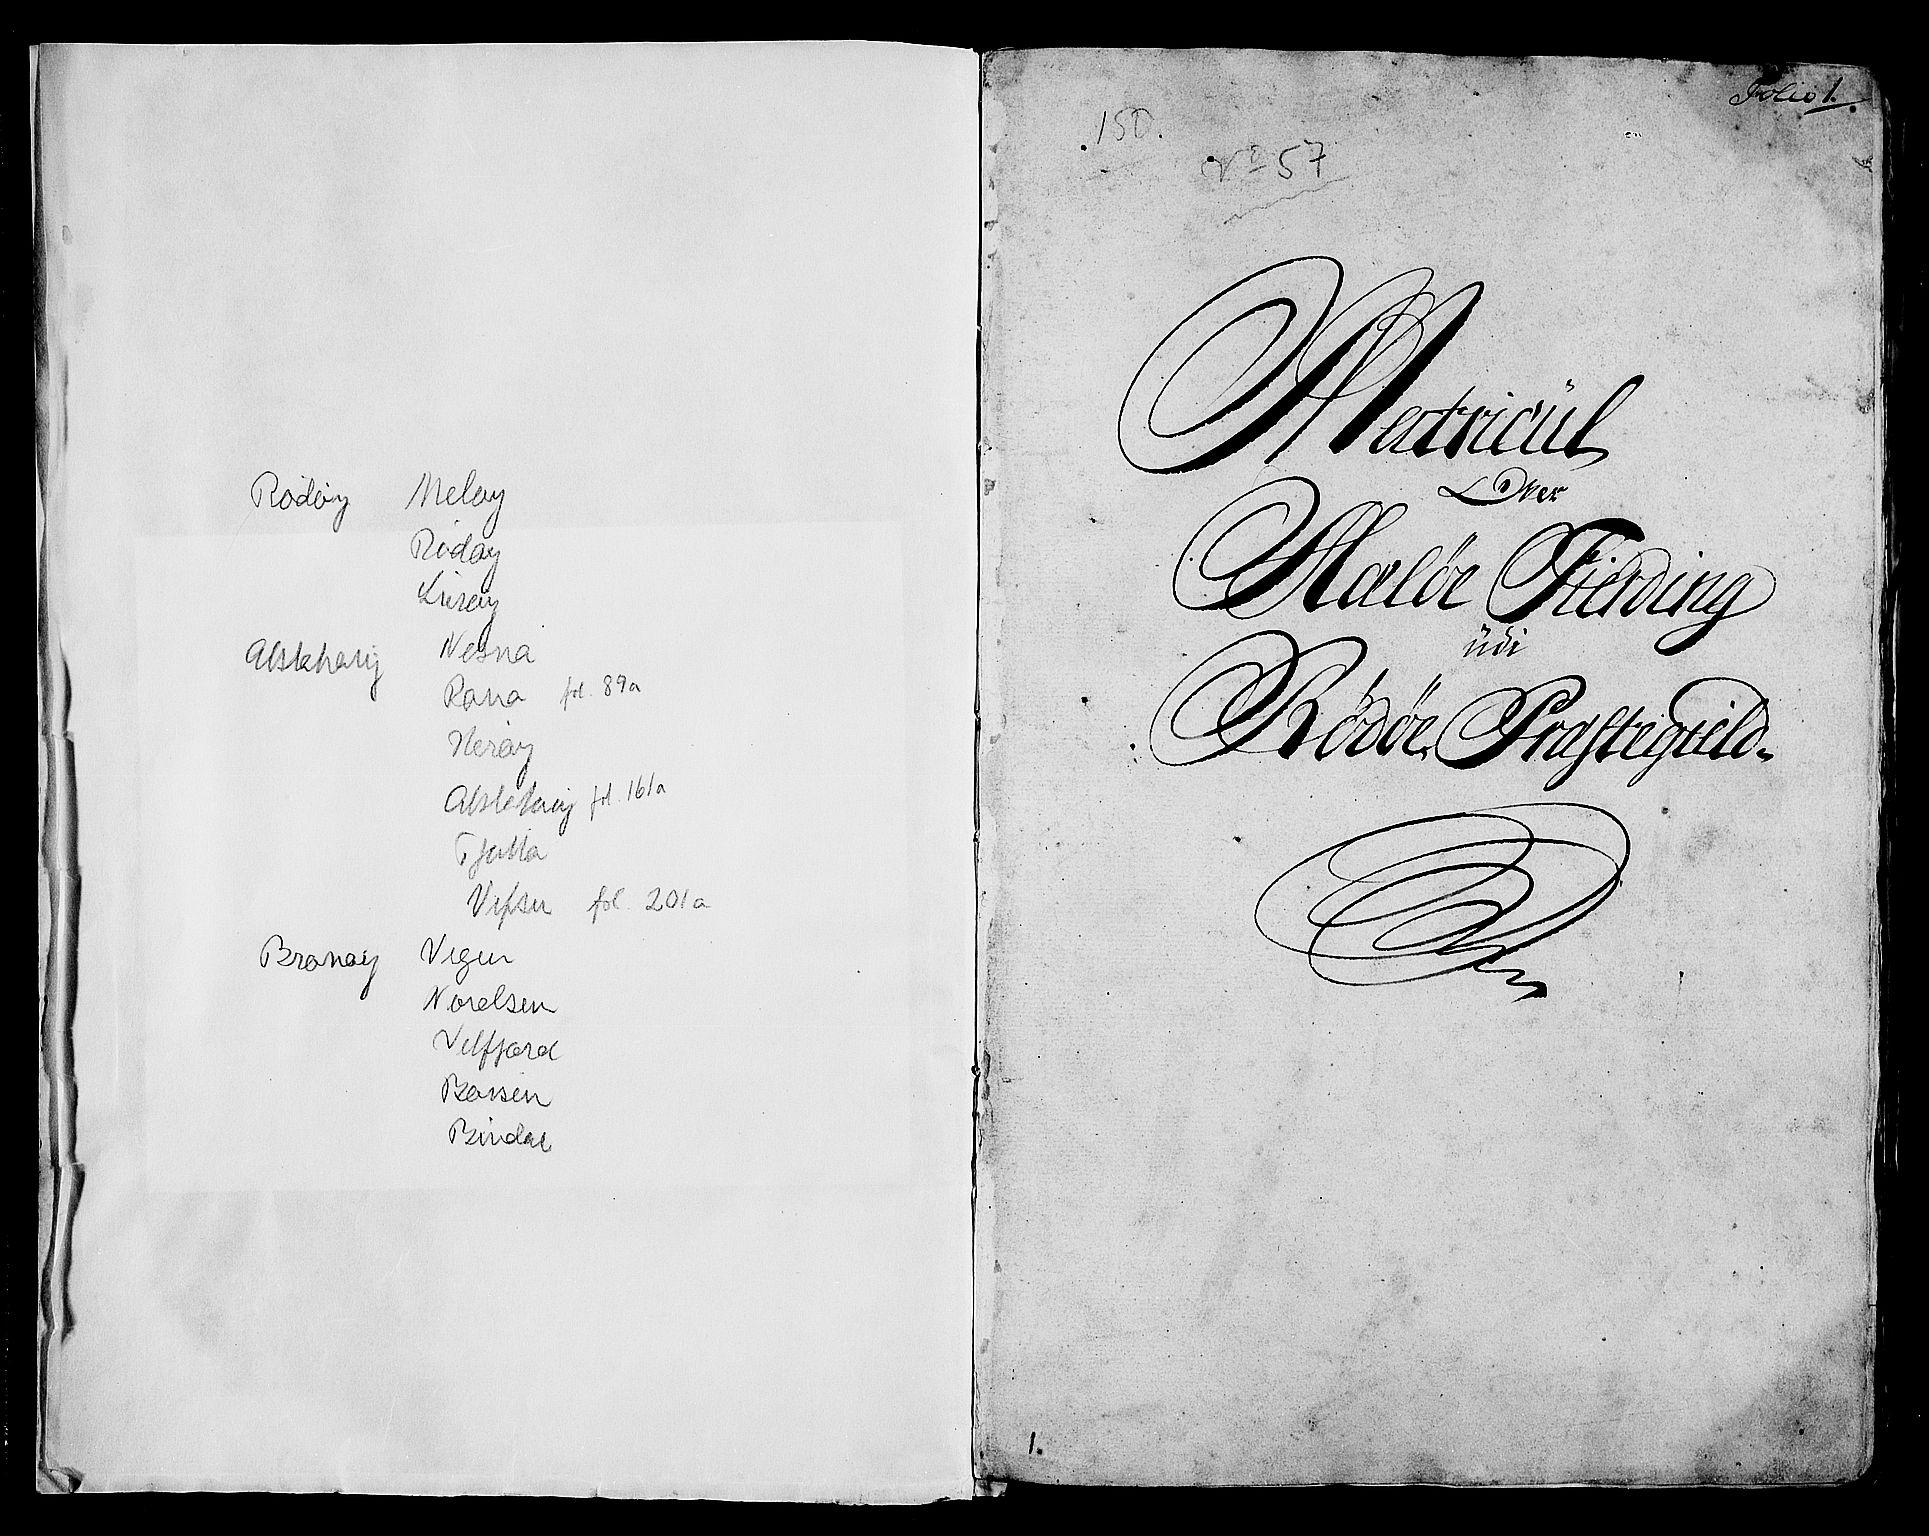 RA, Rentekammeret inntil 1814, Realistisk ordnet avdeling, N/Nb/Nbf/L0171: Helgeland matrikkelprotokoll, 1723, s. 1a